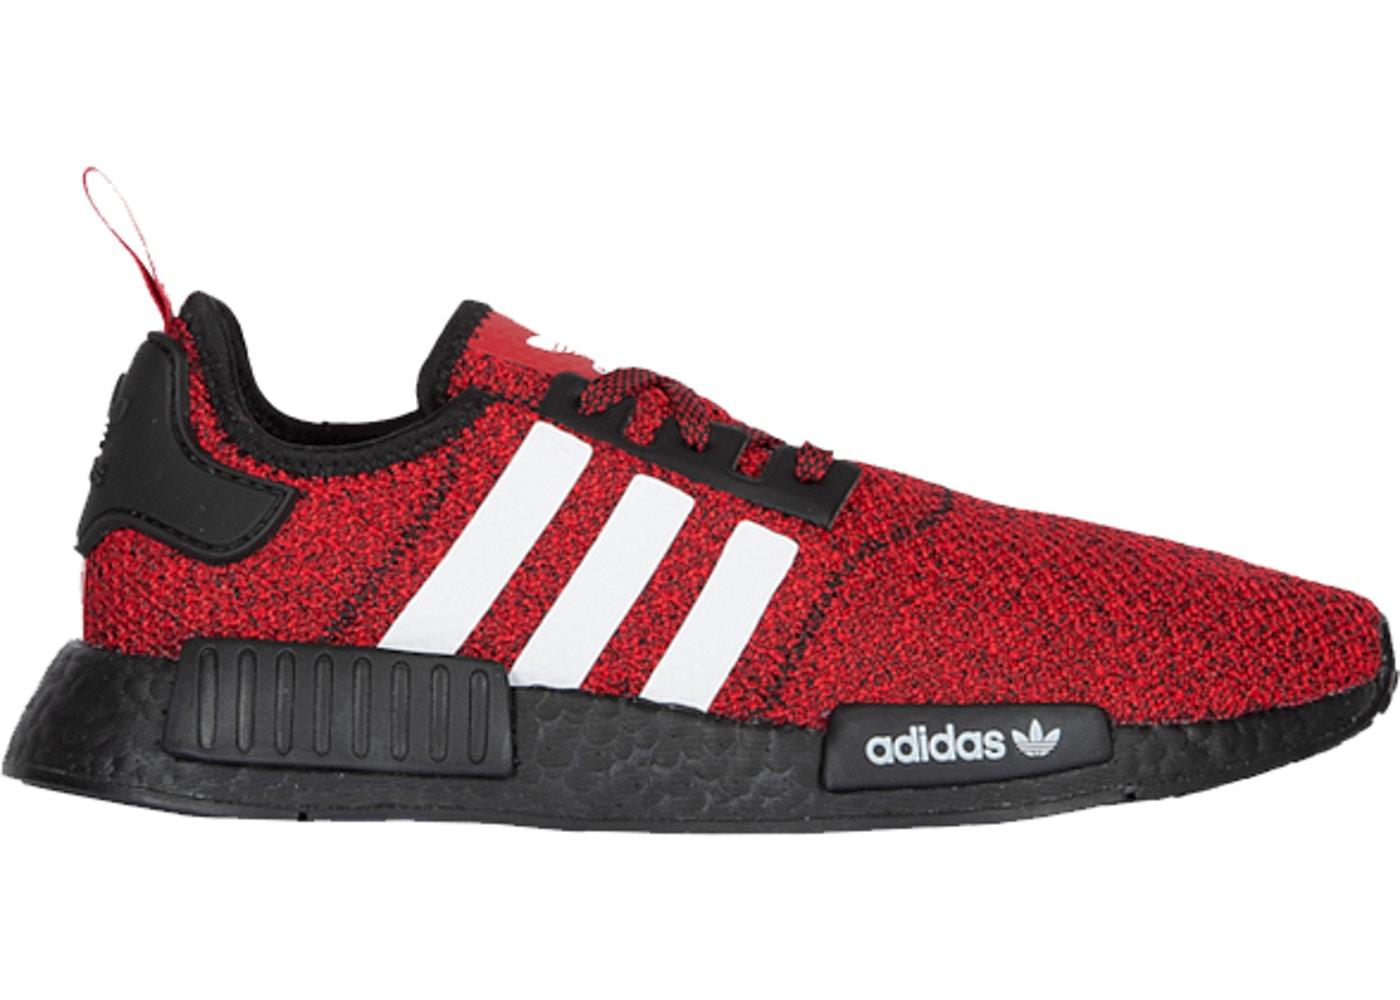 RED WHITE NMD R1 CARBON BLACK FOOTWEAR